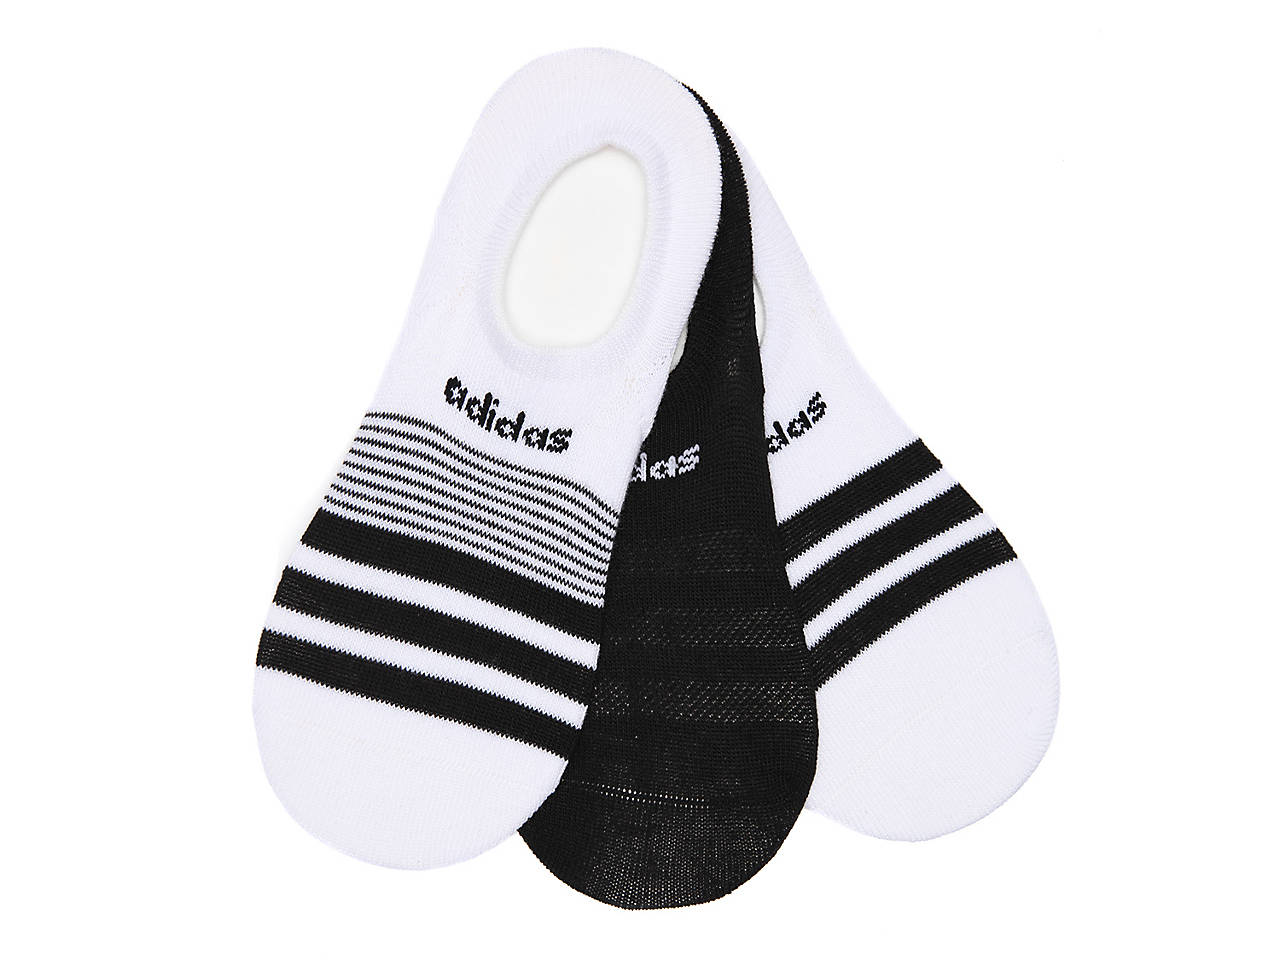 bbed86f0ffaf adidas Superlite Women s No Show Socks - 3 Pack Women s Handbags ...